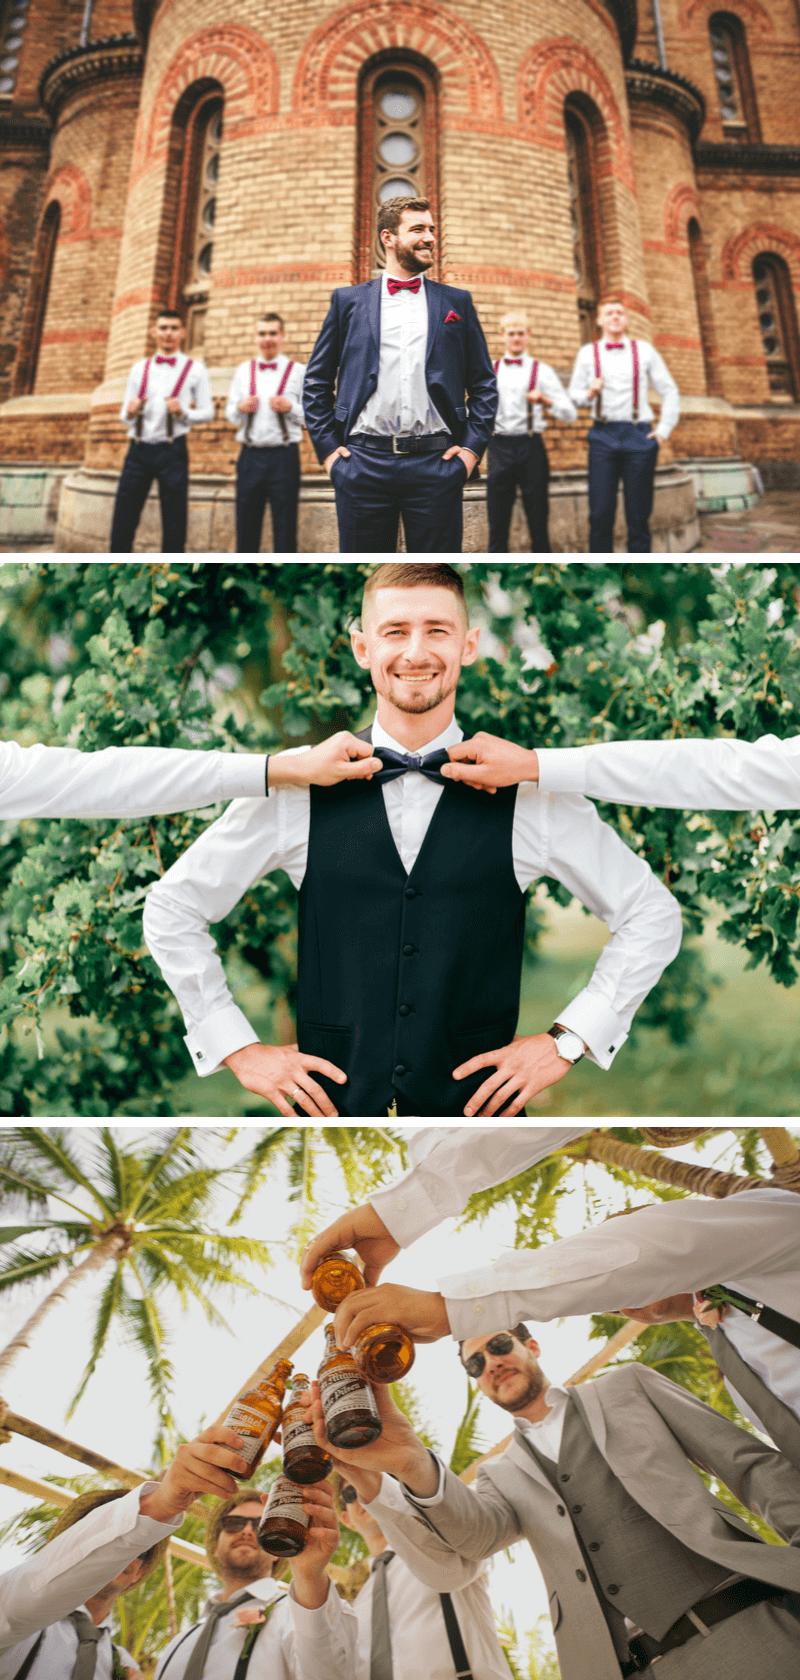 Fotos Bräutigam mit Jungs